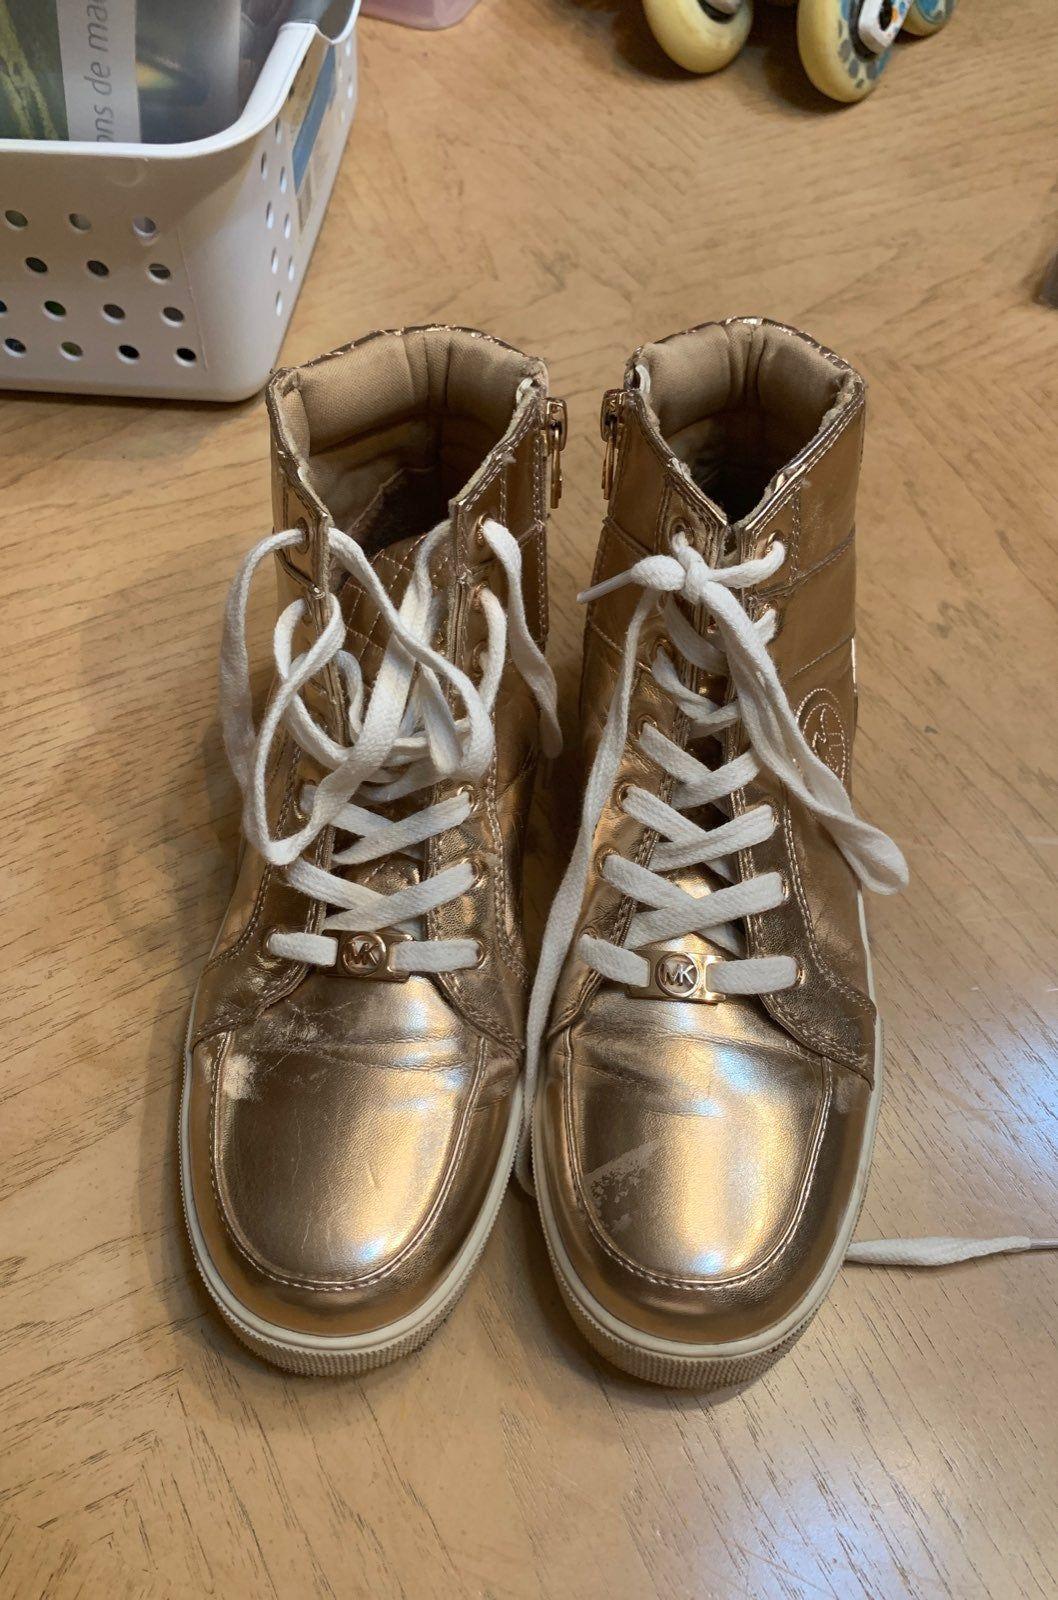 Michael Kors gold converse shoes. My